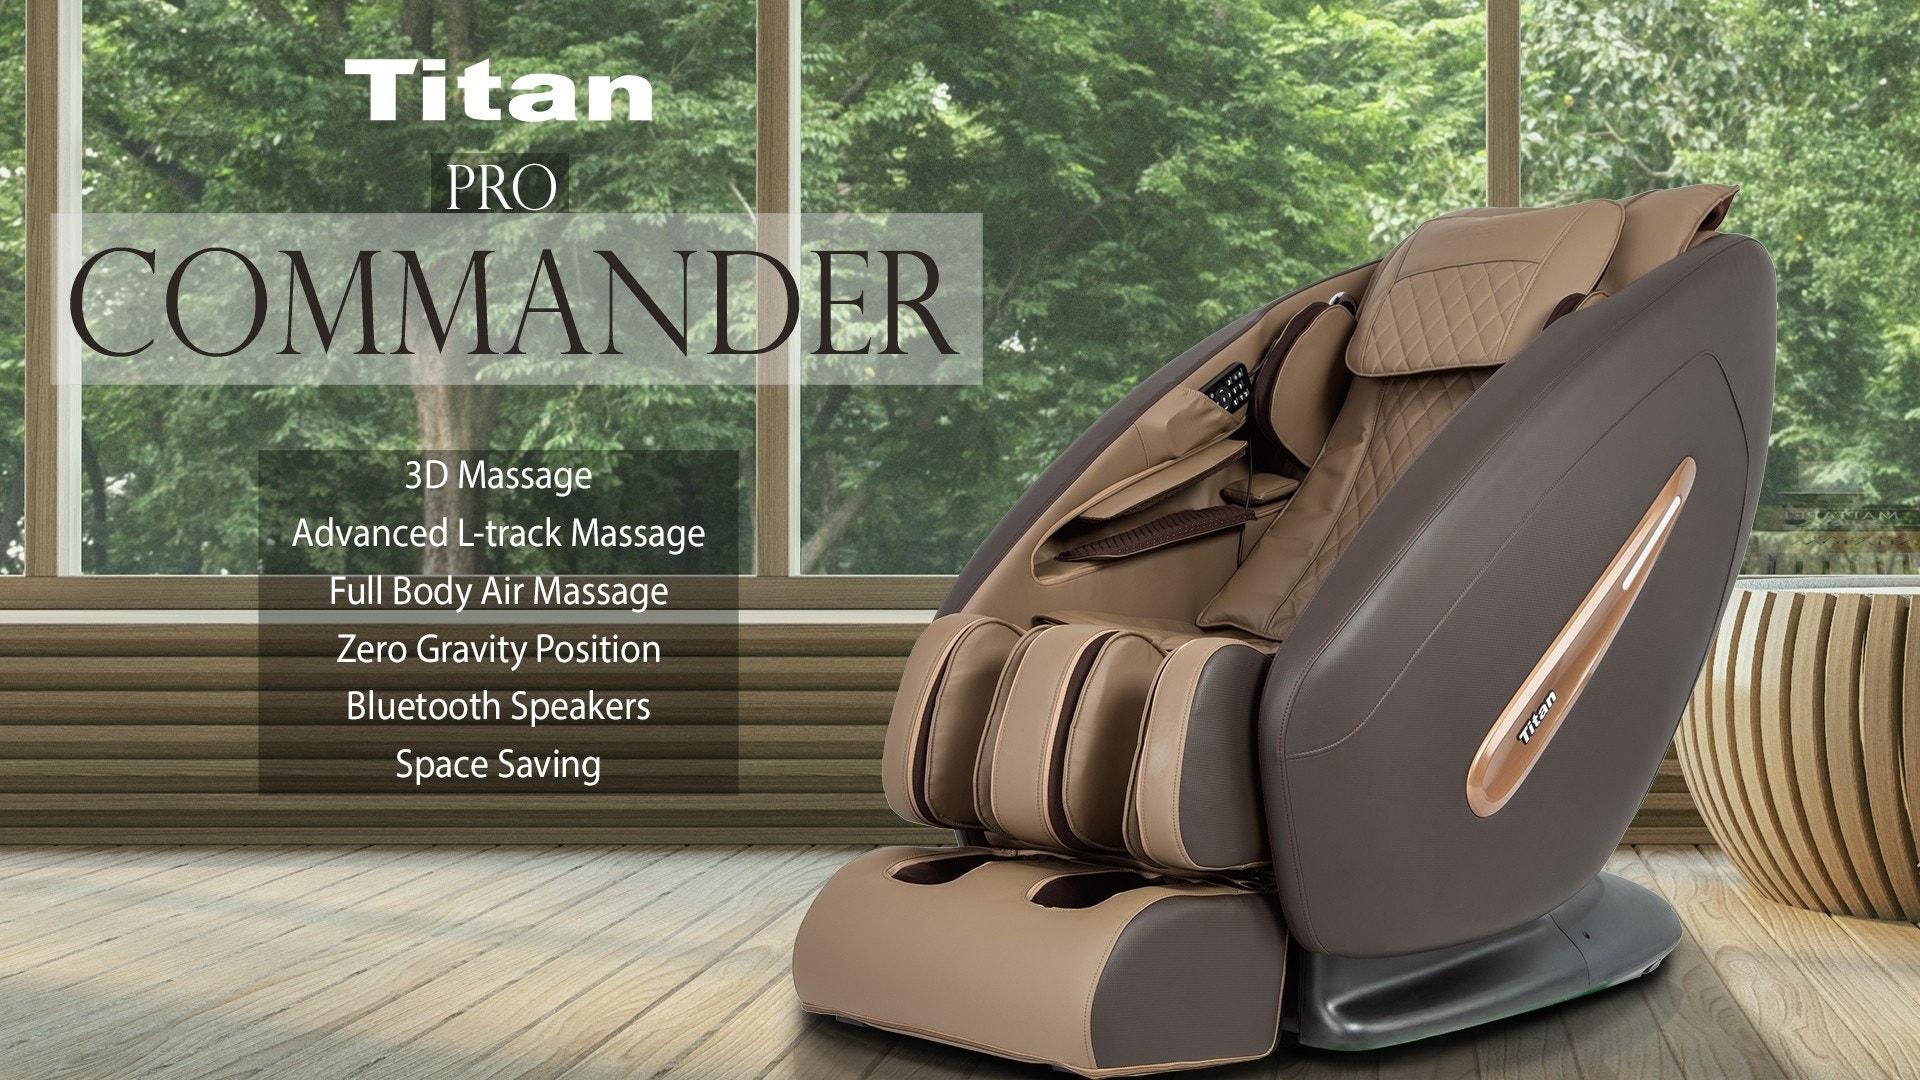 Titan Pro Commander